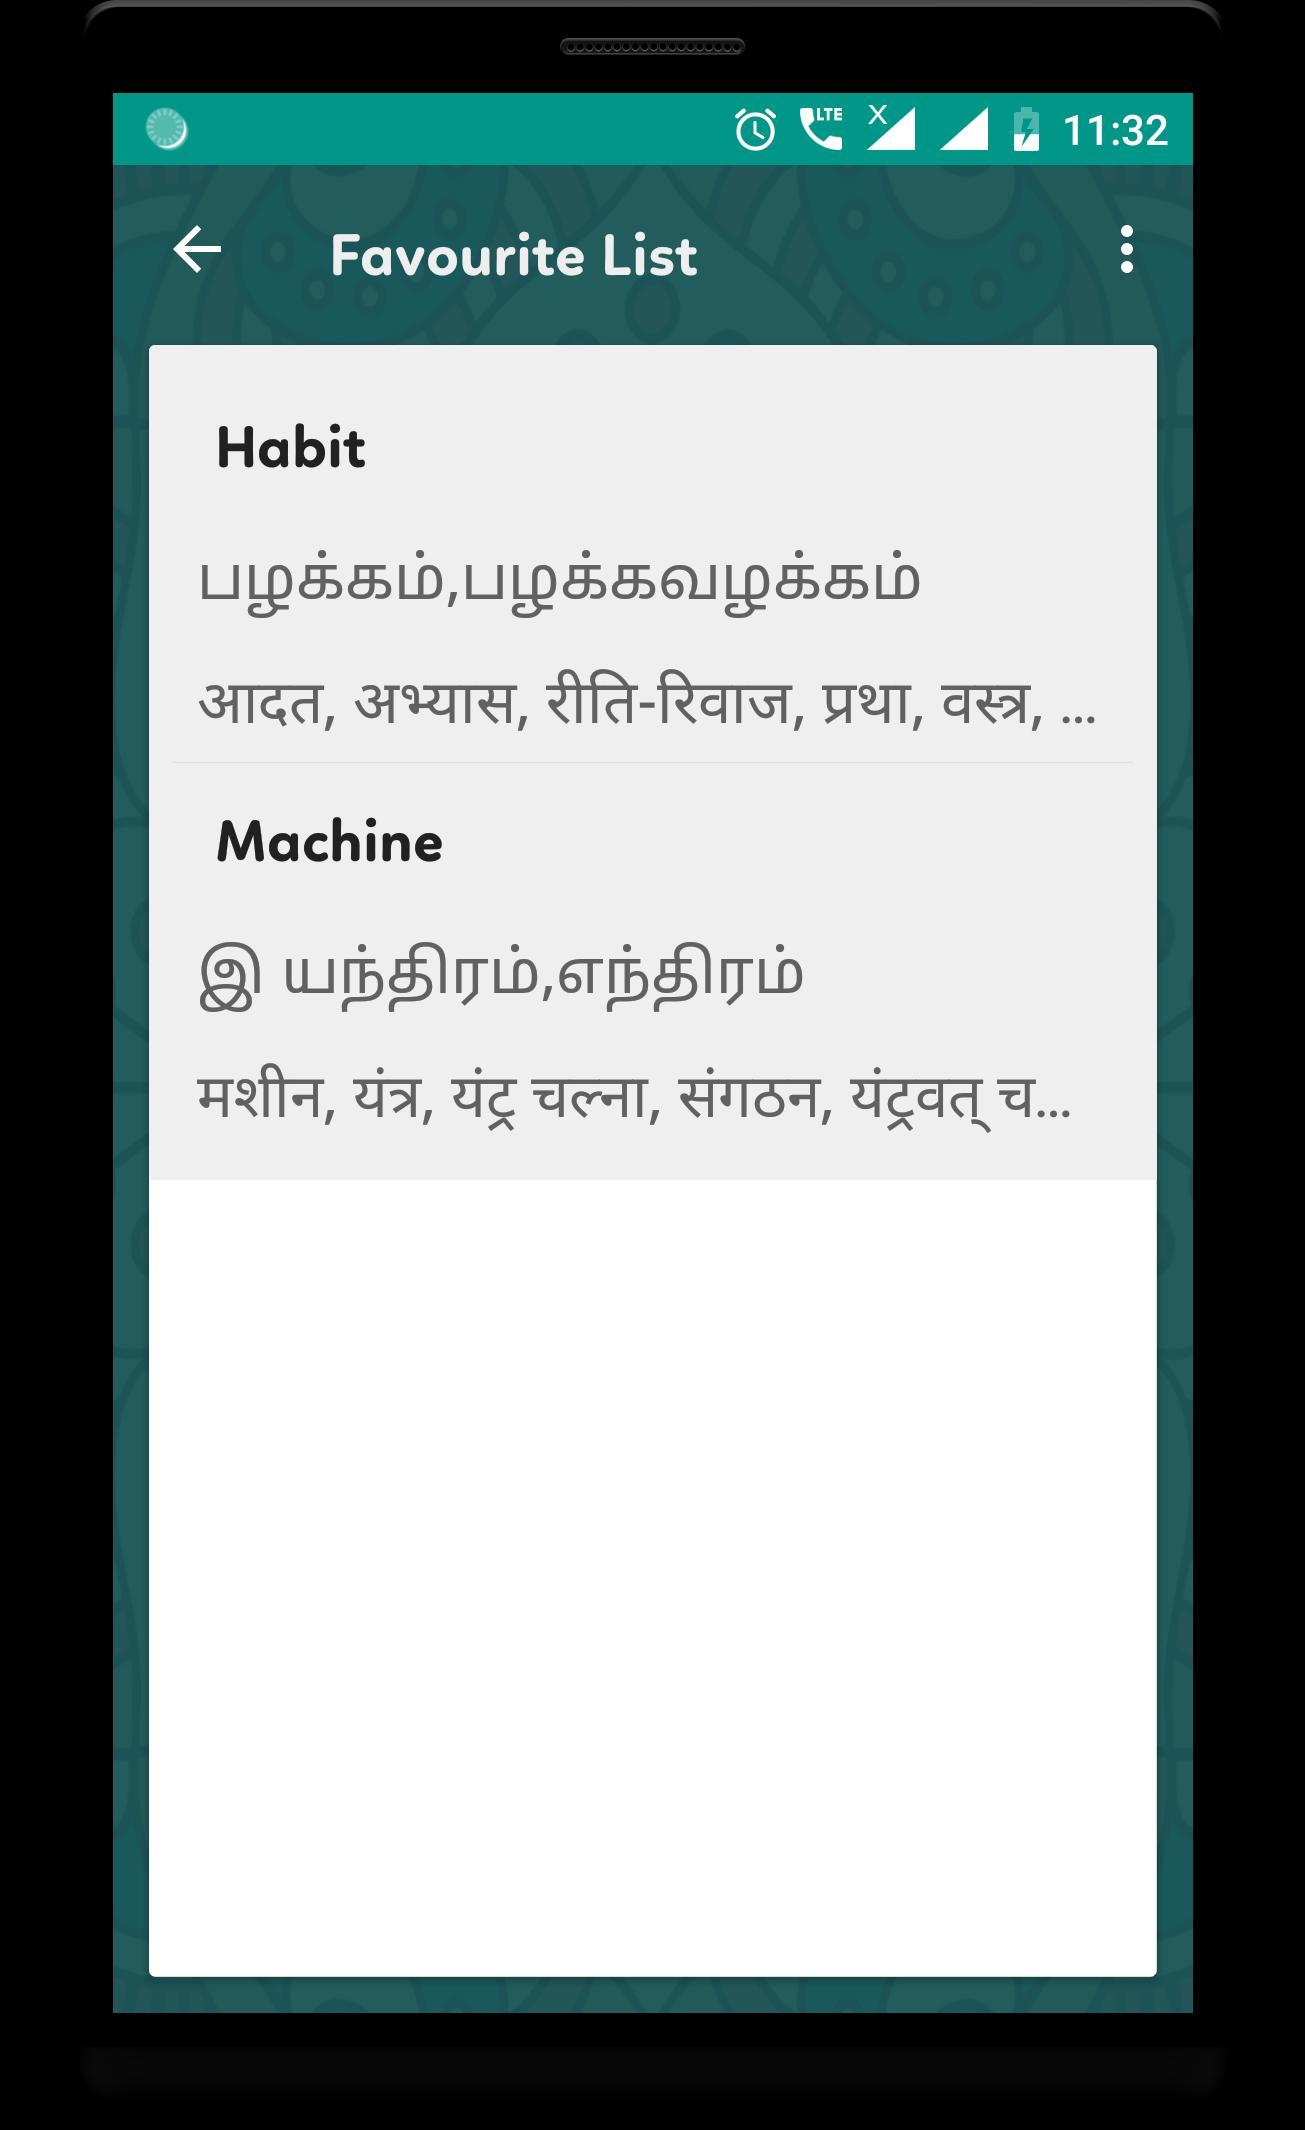 English to Tamil Translator and Hindi Dictionary for Android